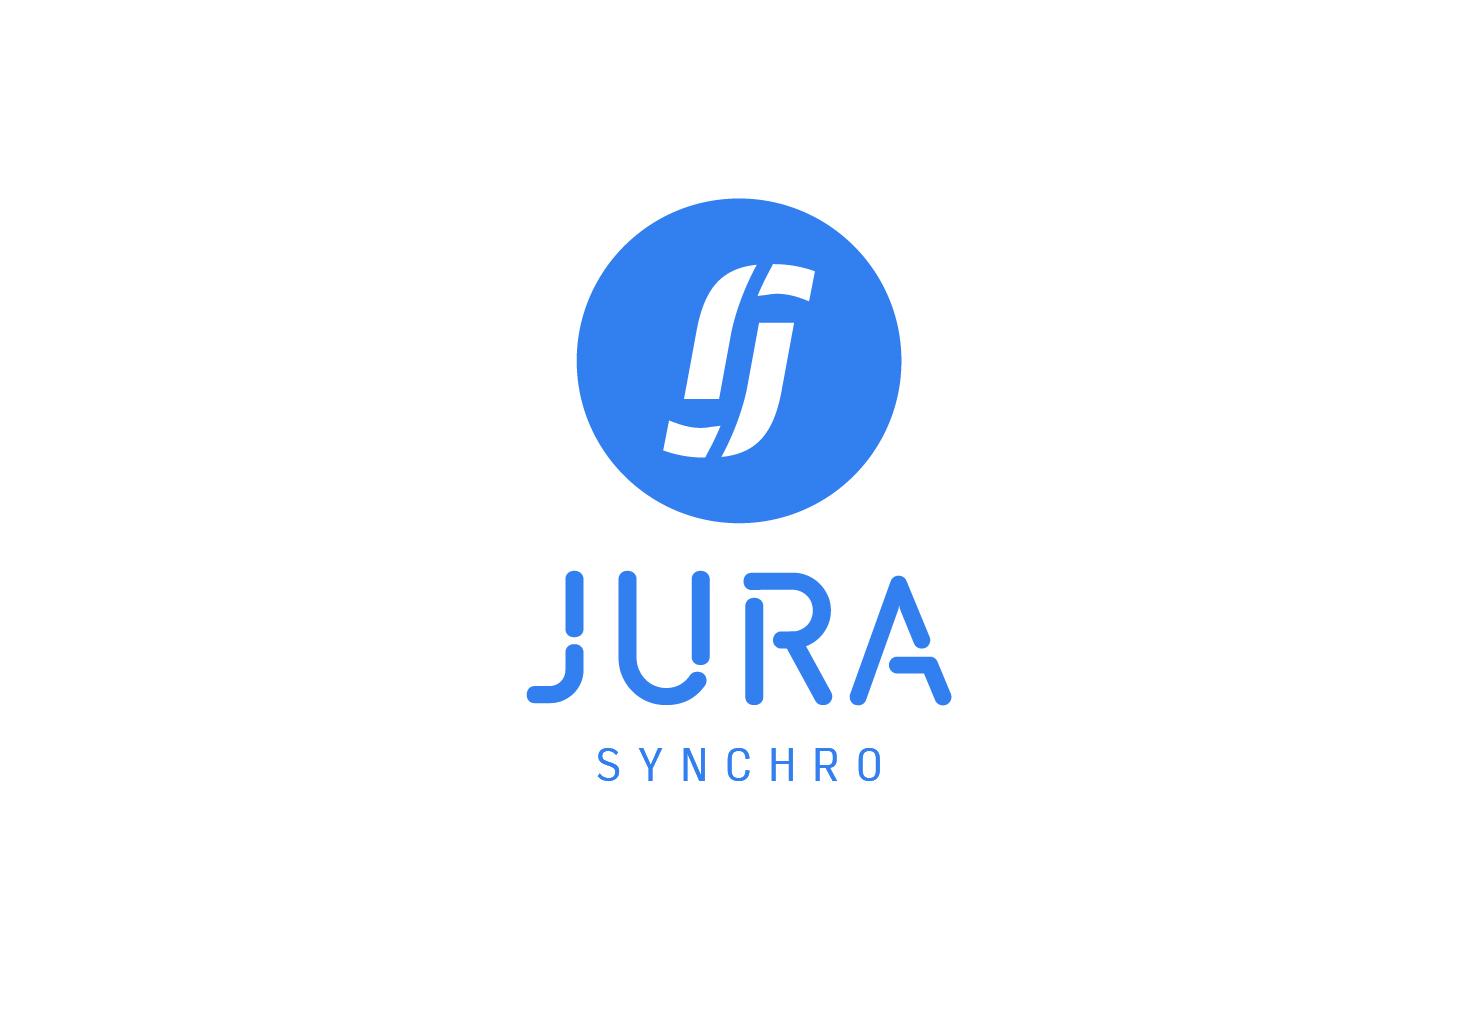 Jura Synchro Logo. Design by Annick & Yannick. Jura.